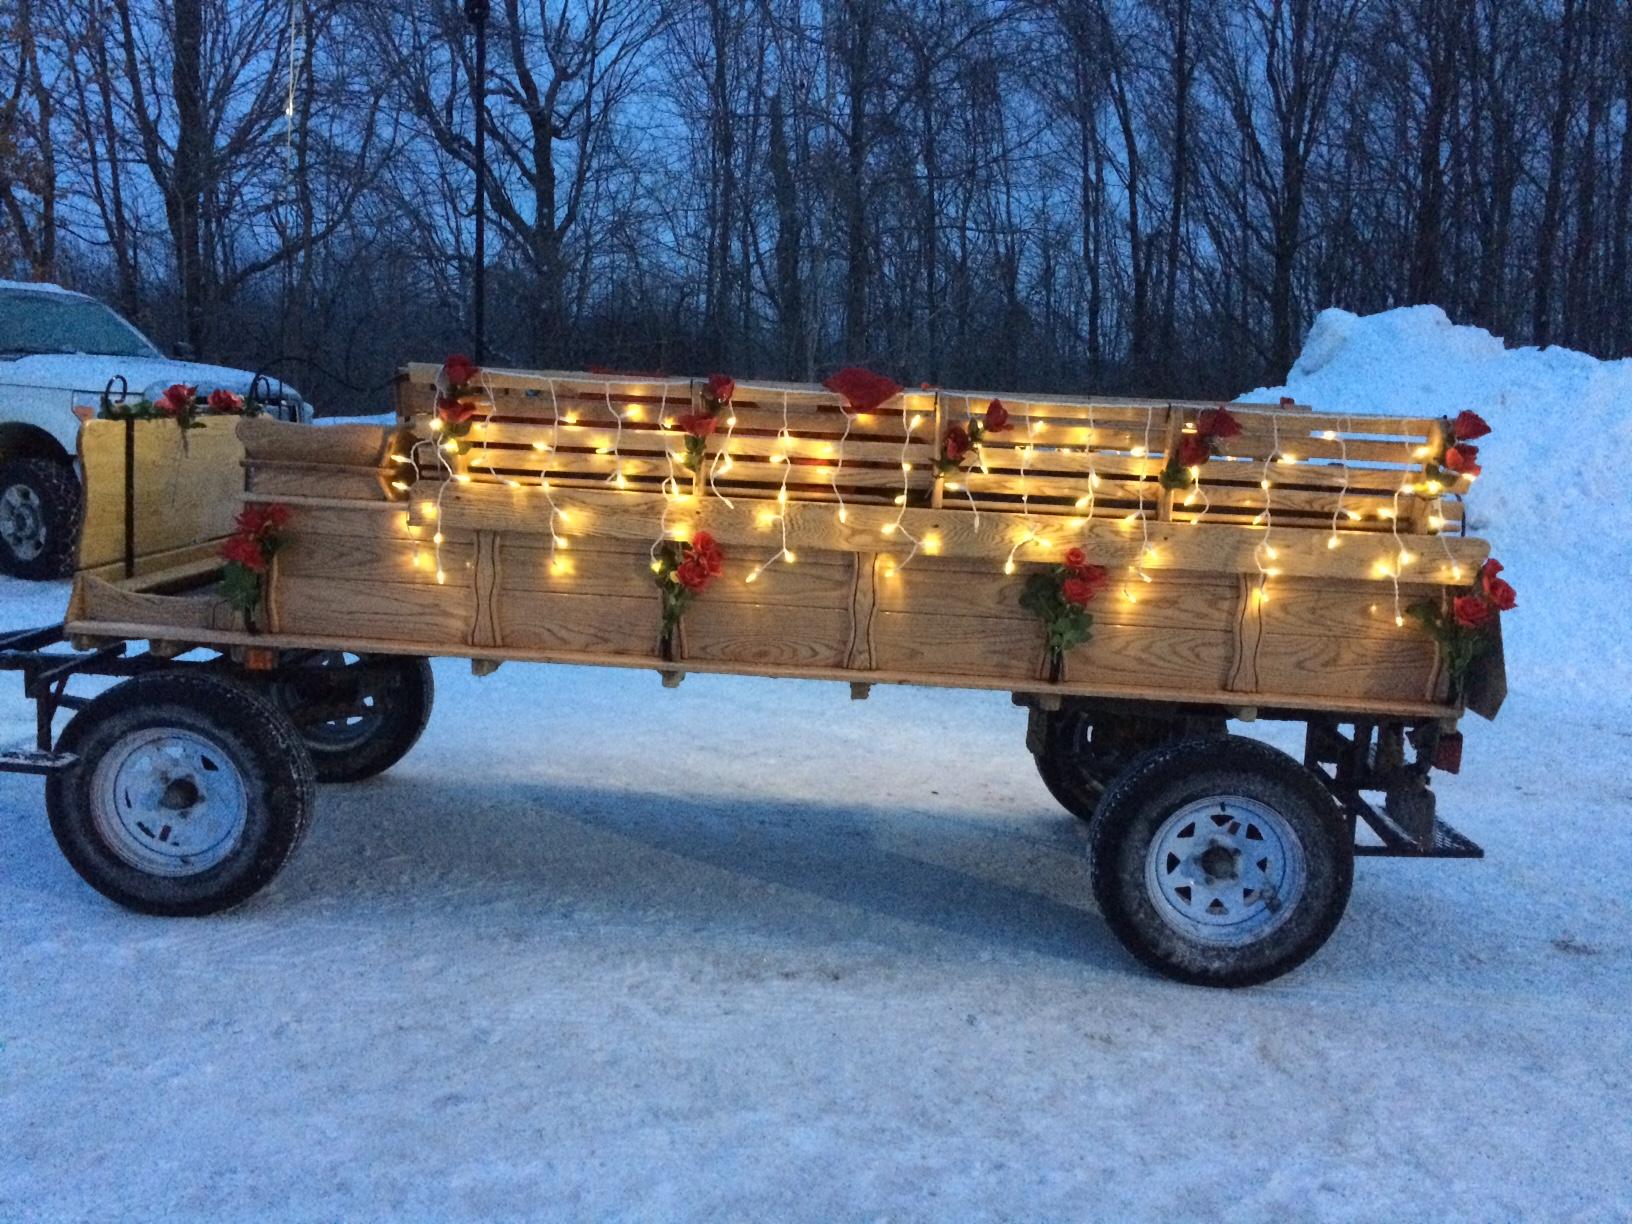 Lighted Wagon